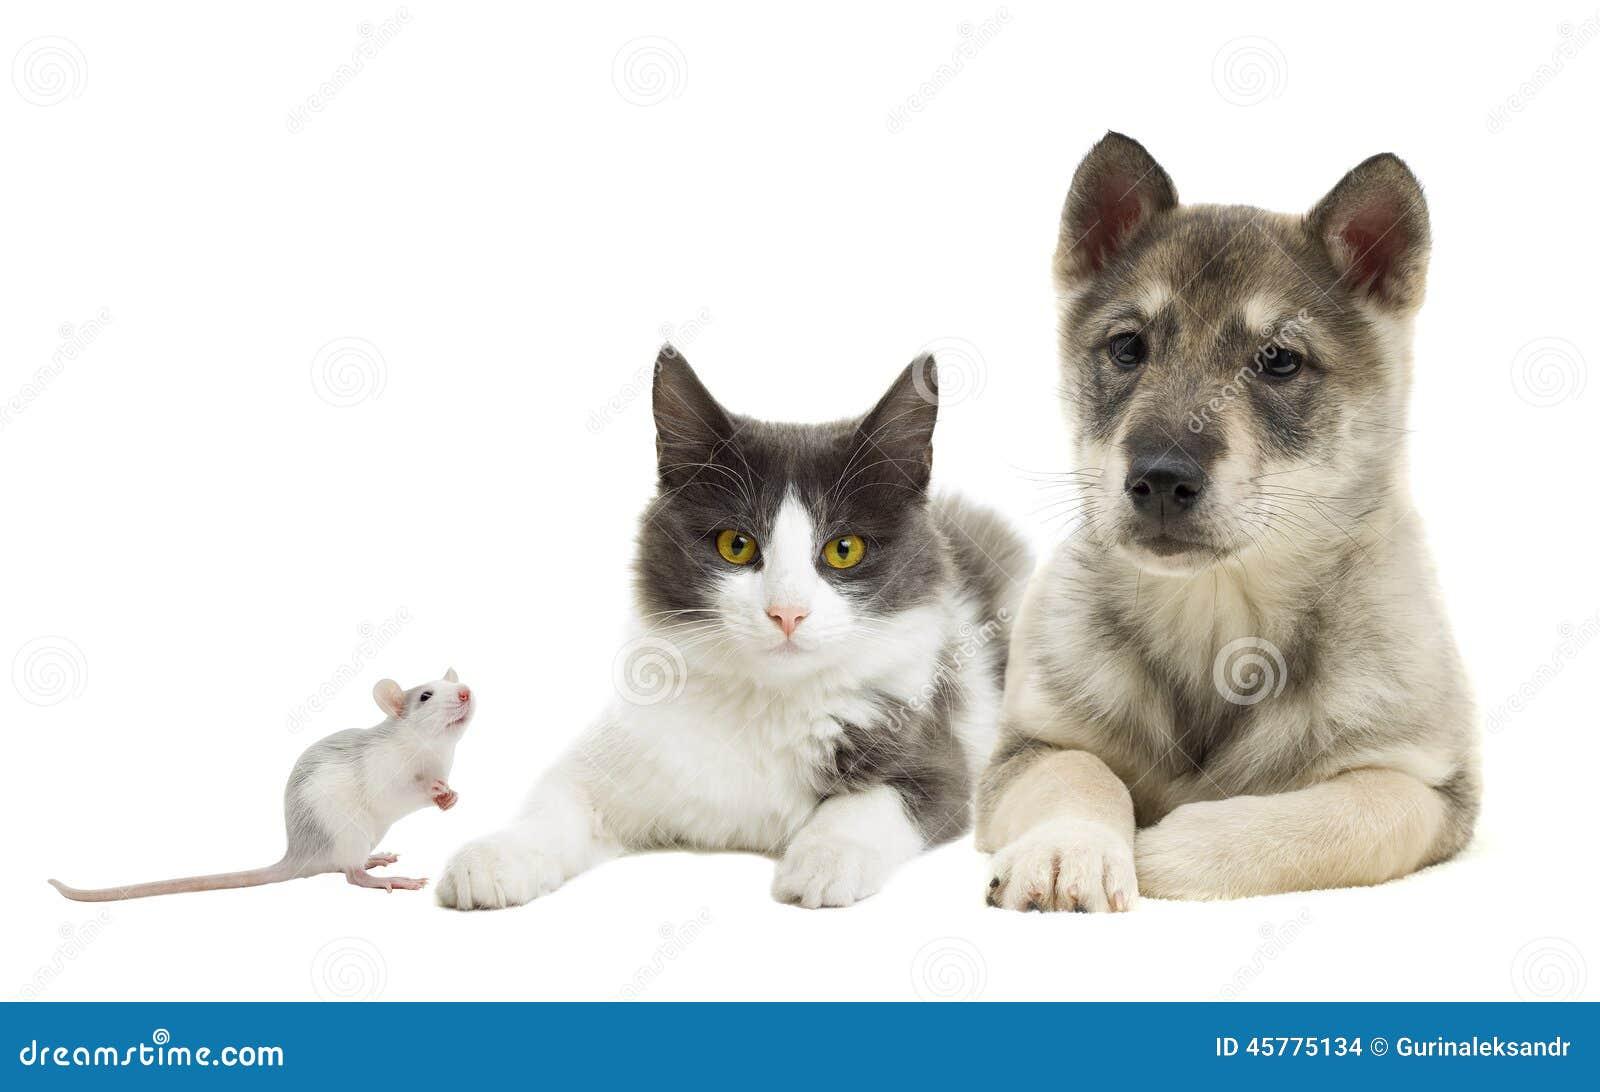 how to set free pets prodigy